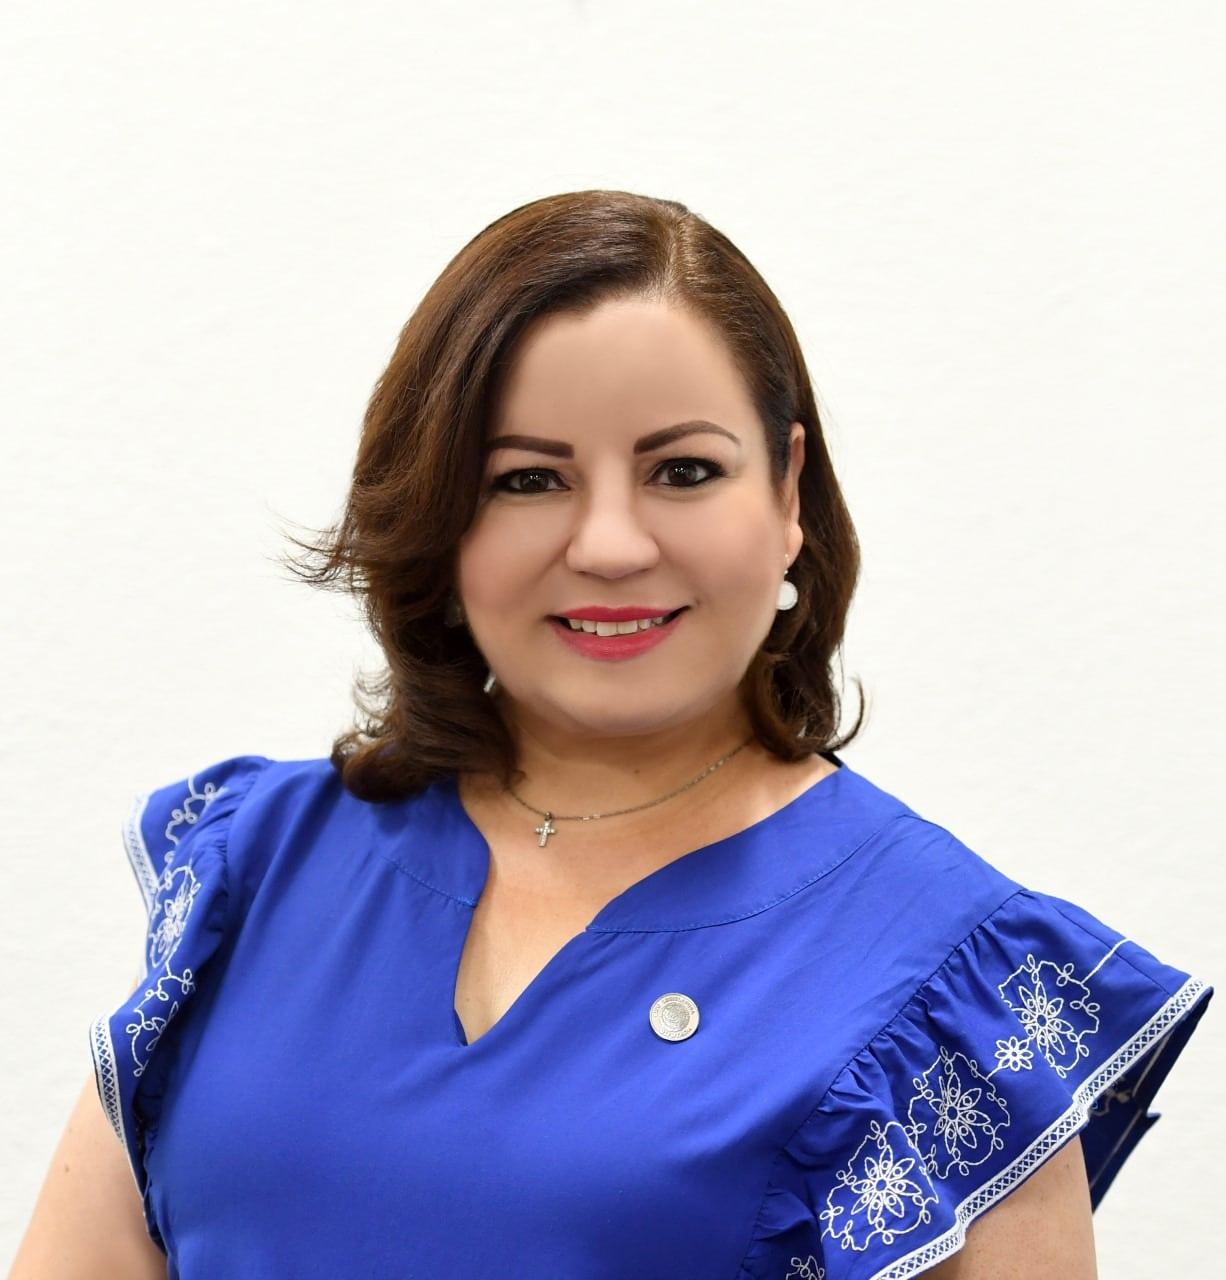 Madeleine Bonnafoux Alcaraz